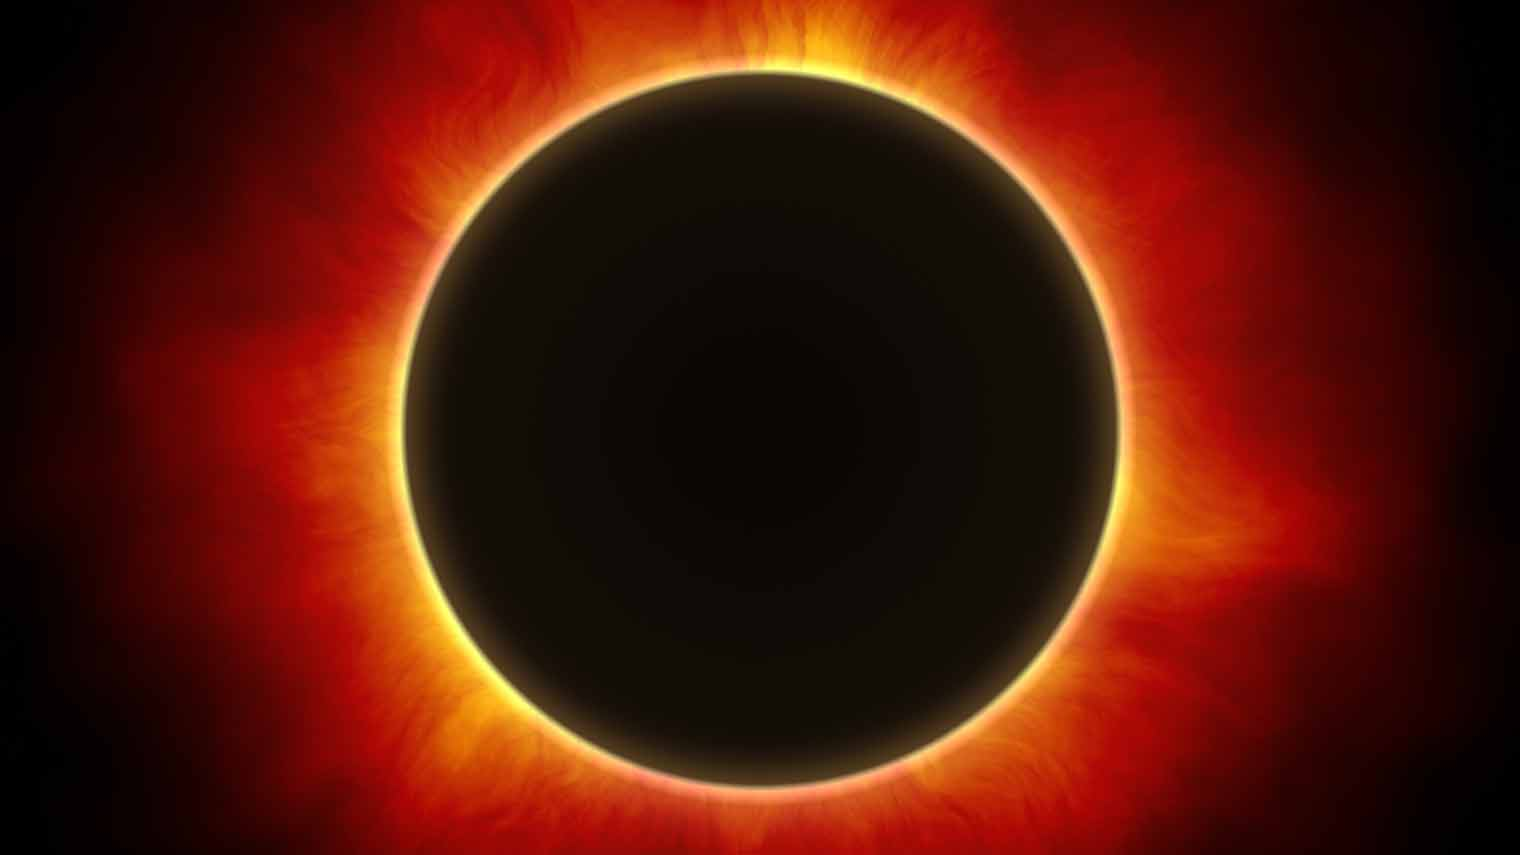 In augustus totale zonsverduistering in de VS